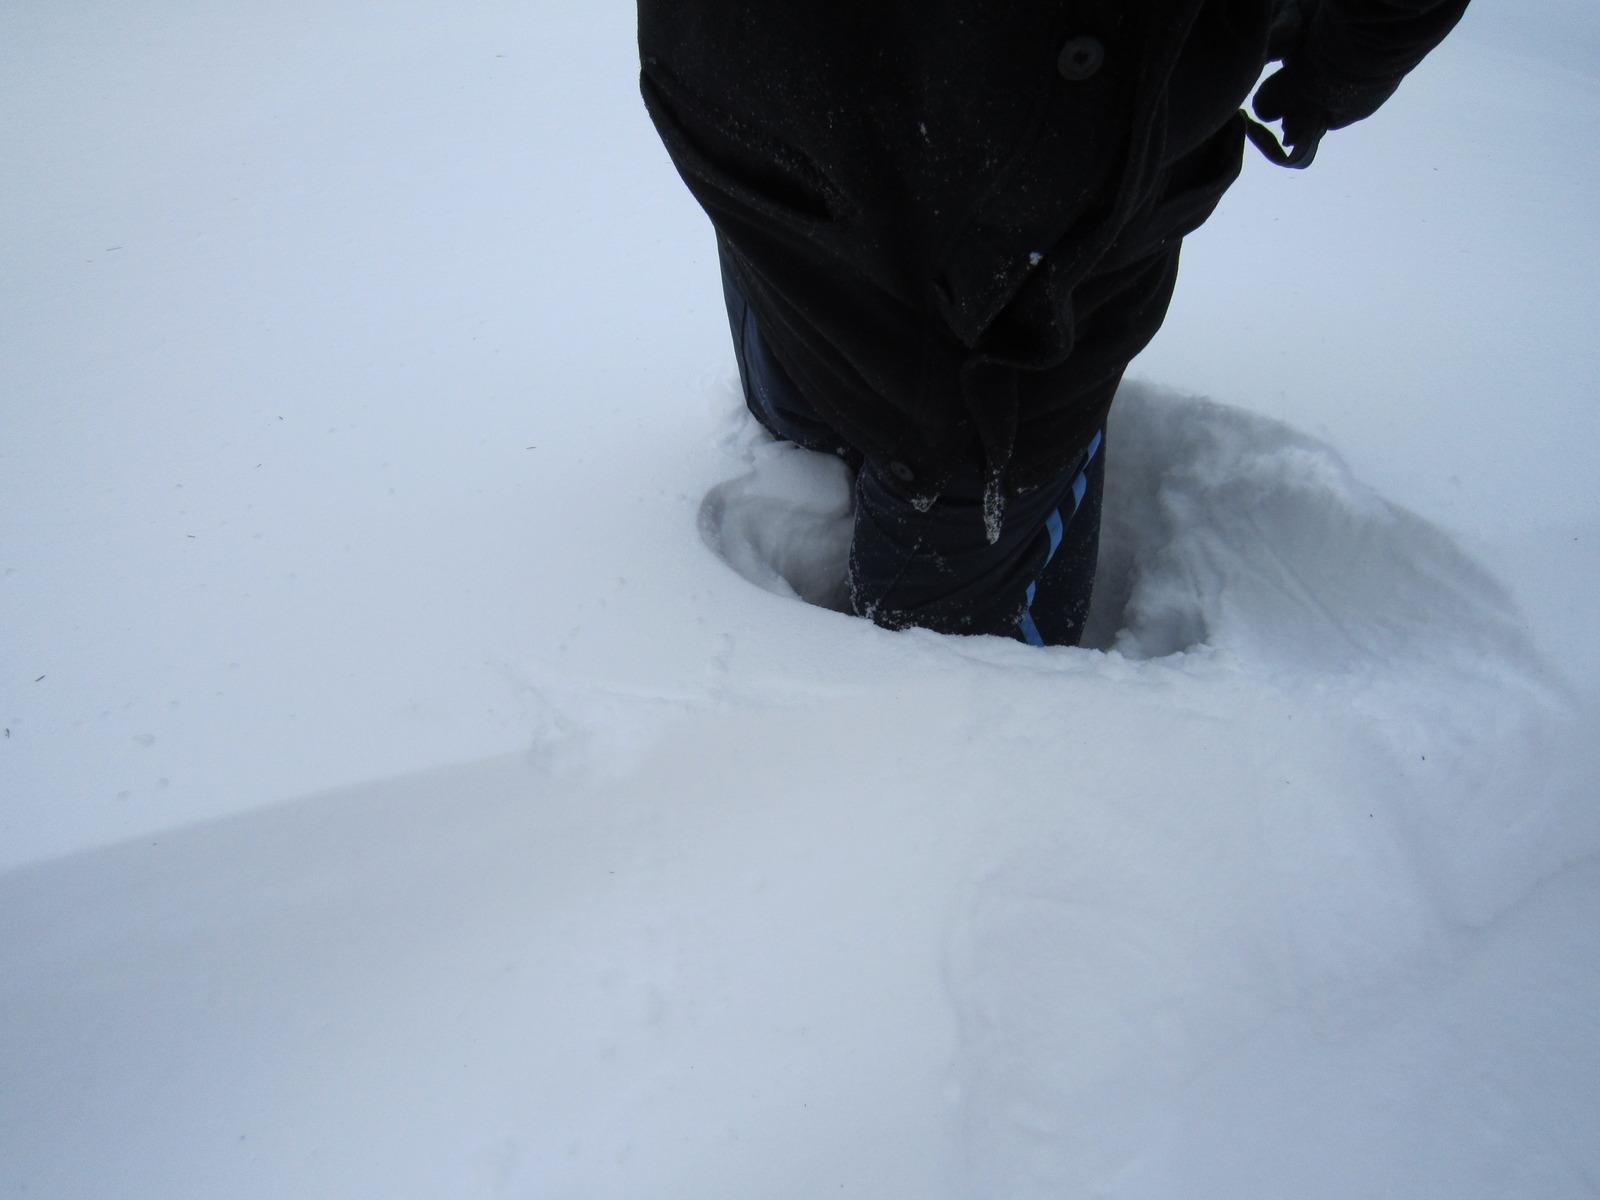 Blizzard feb 2 2011 (4)